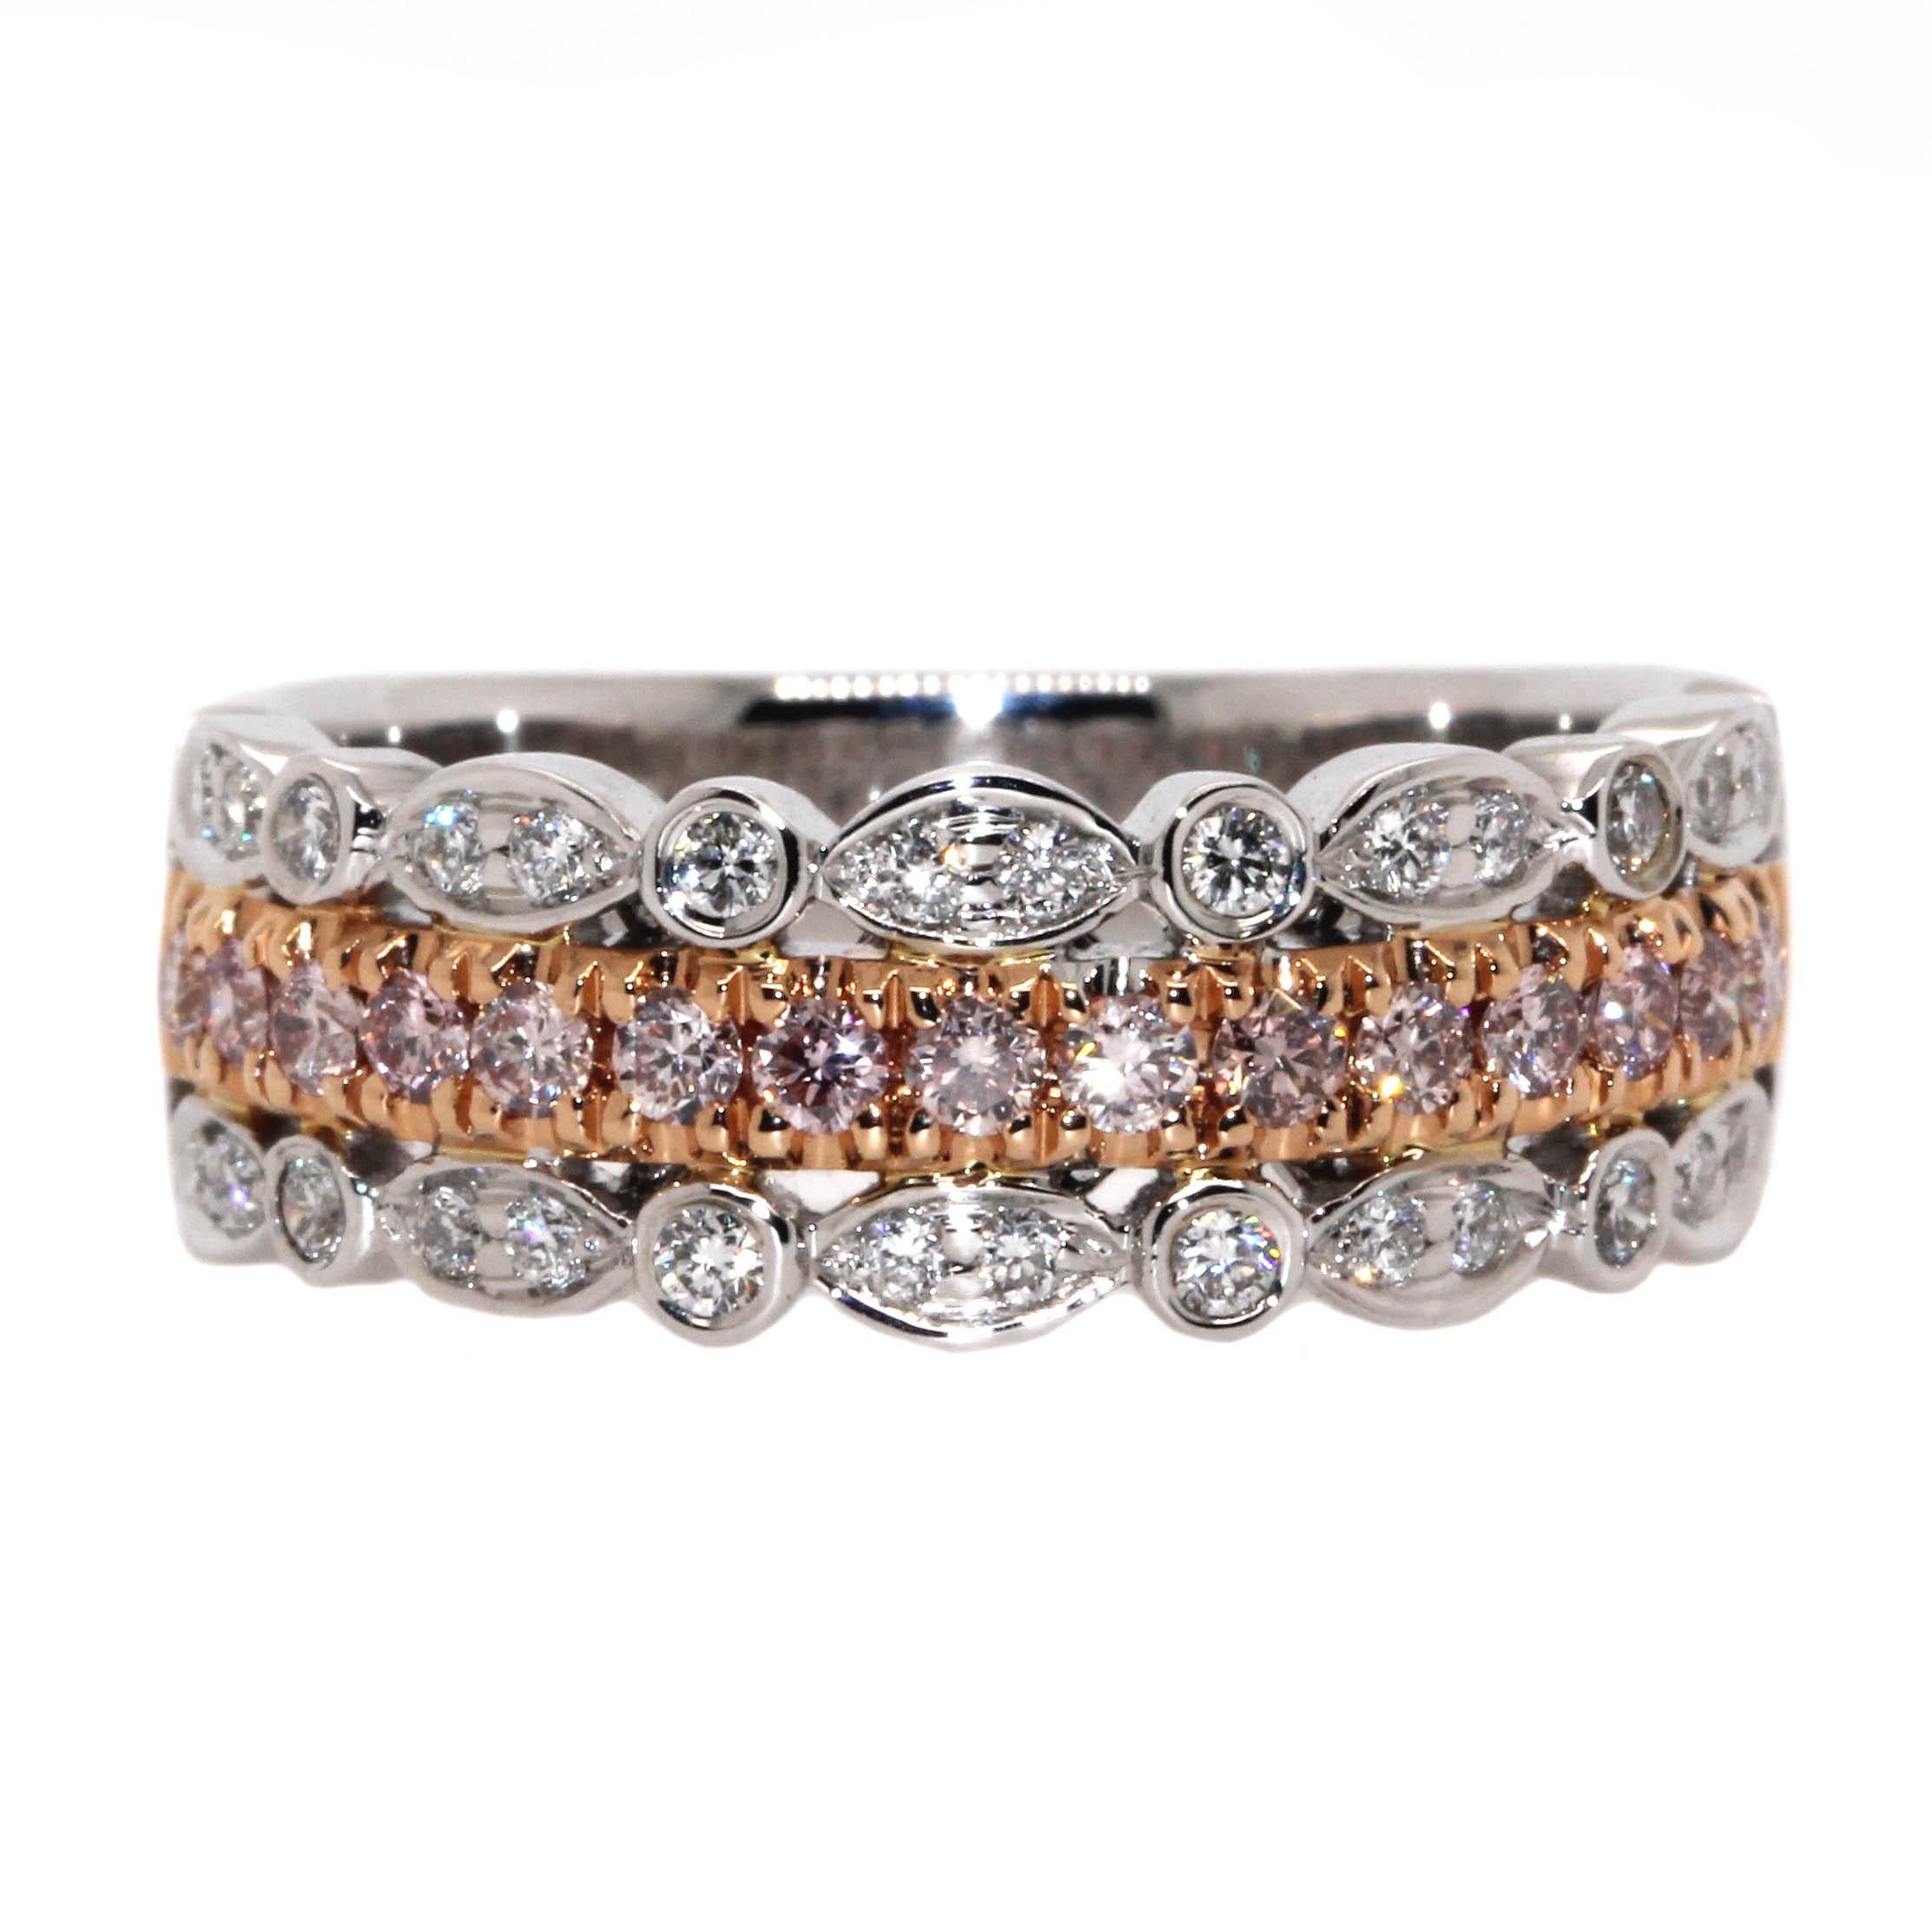 diamonds on band ring with pink diamonds